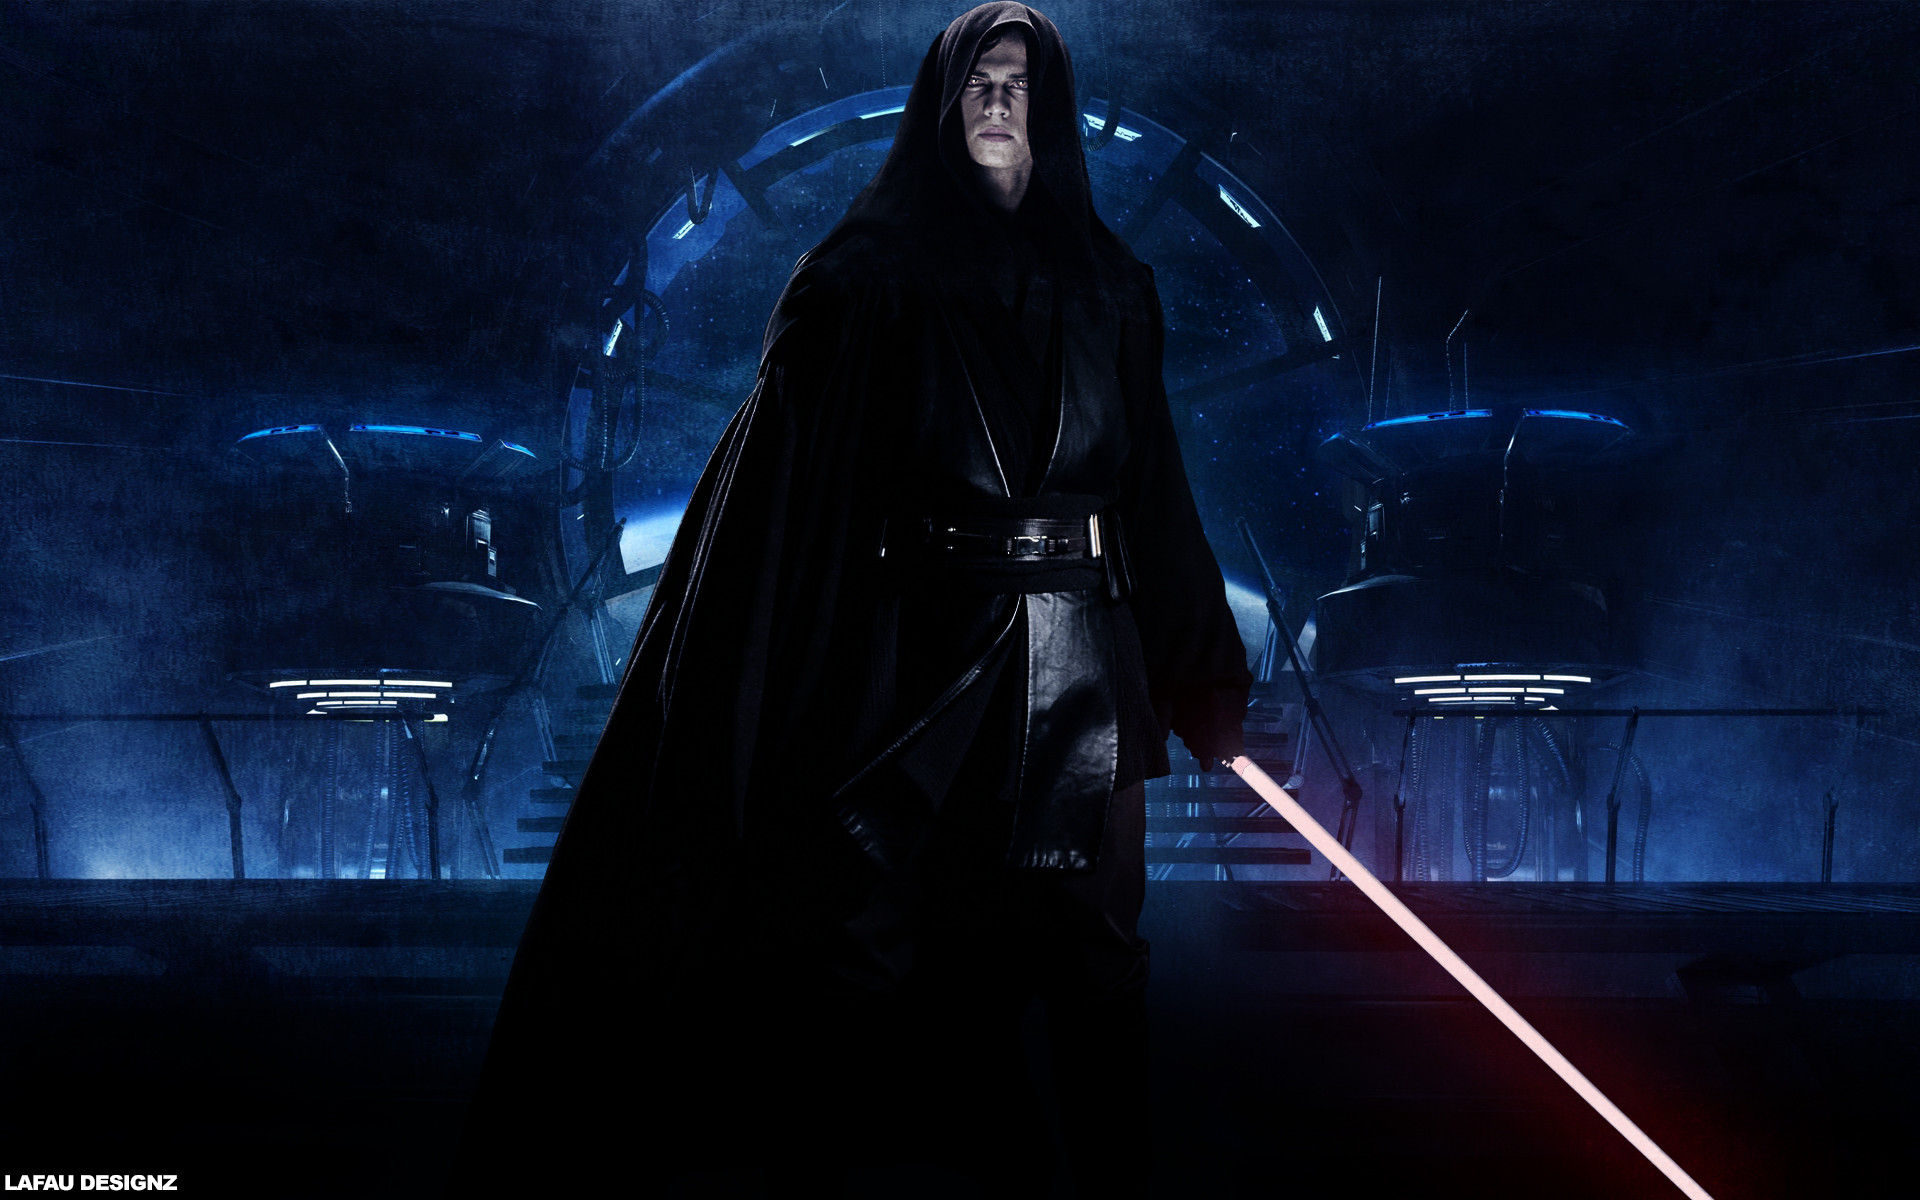 Star Wars Anakin Skywalker Wallpaper (75+ images)